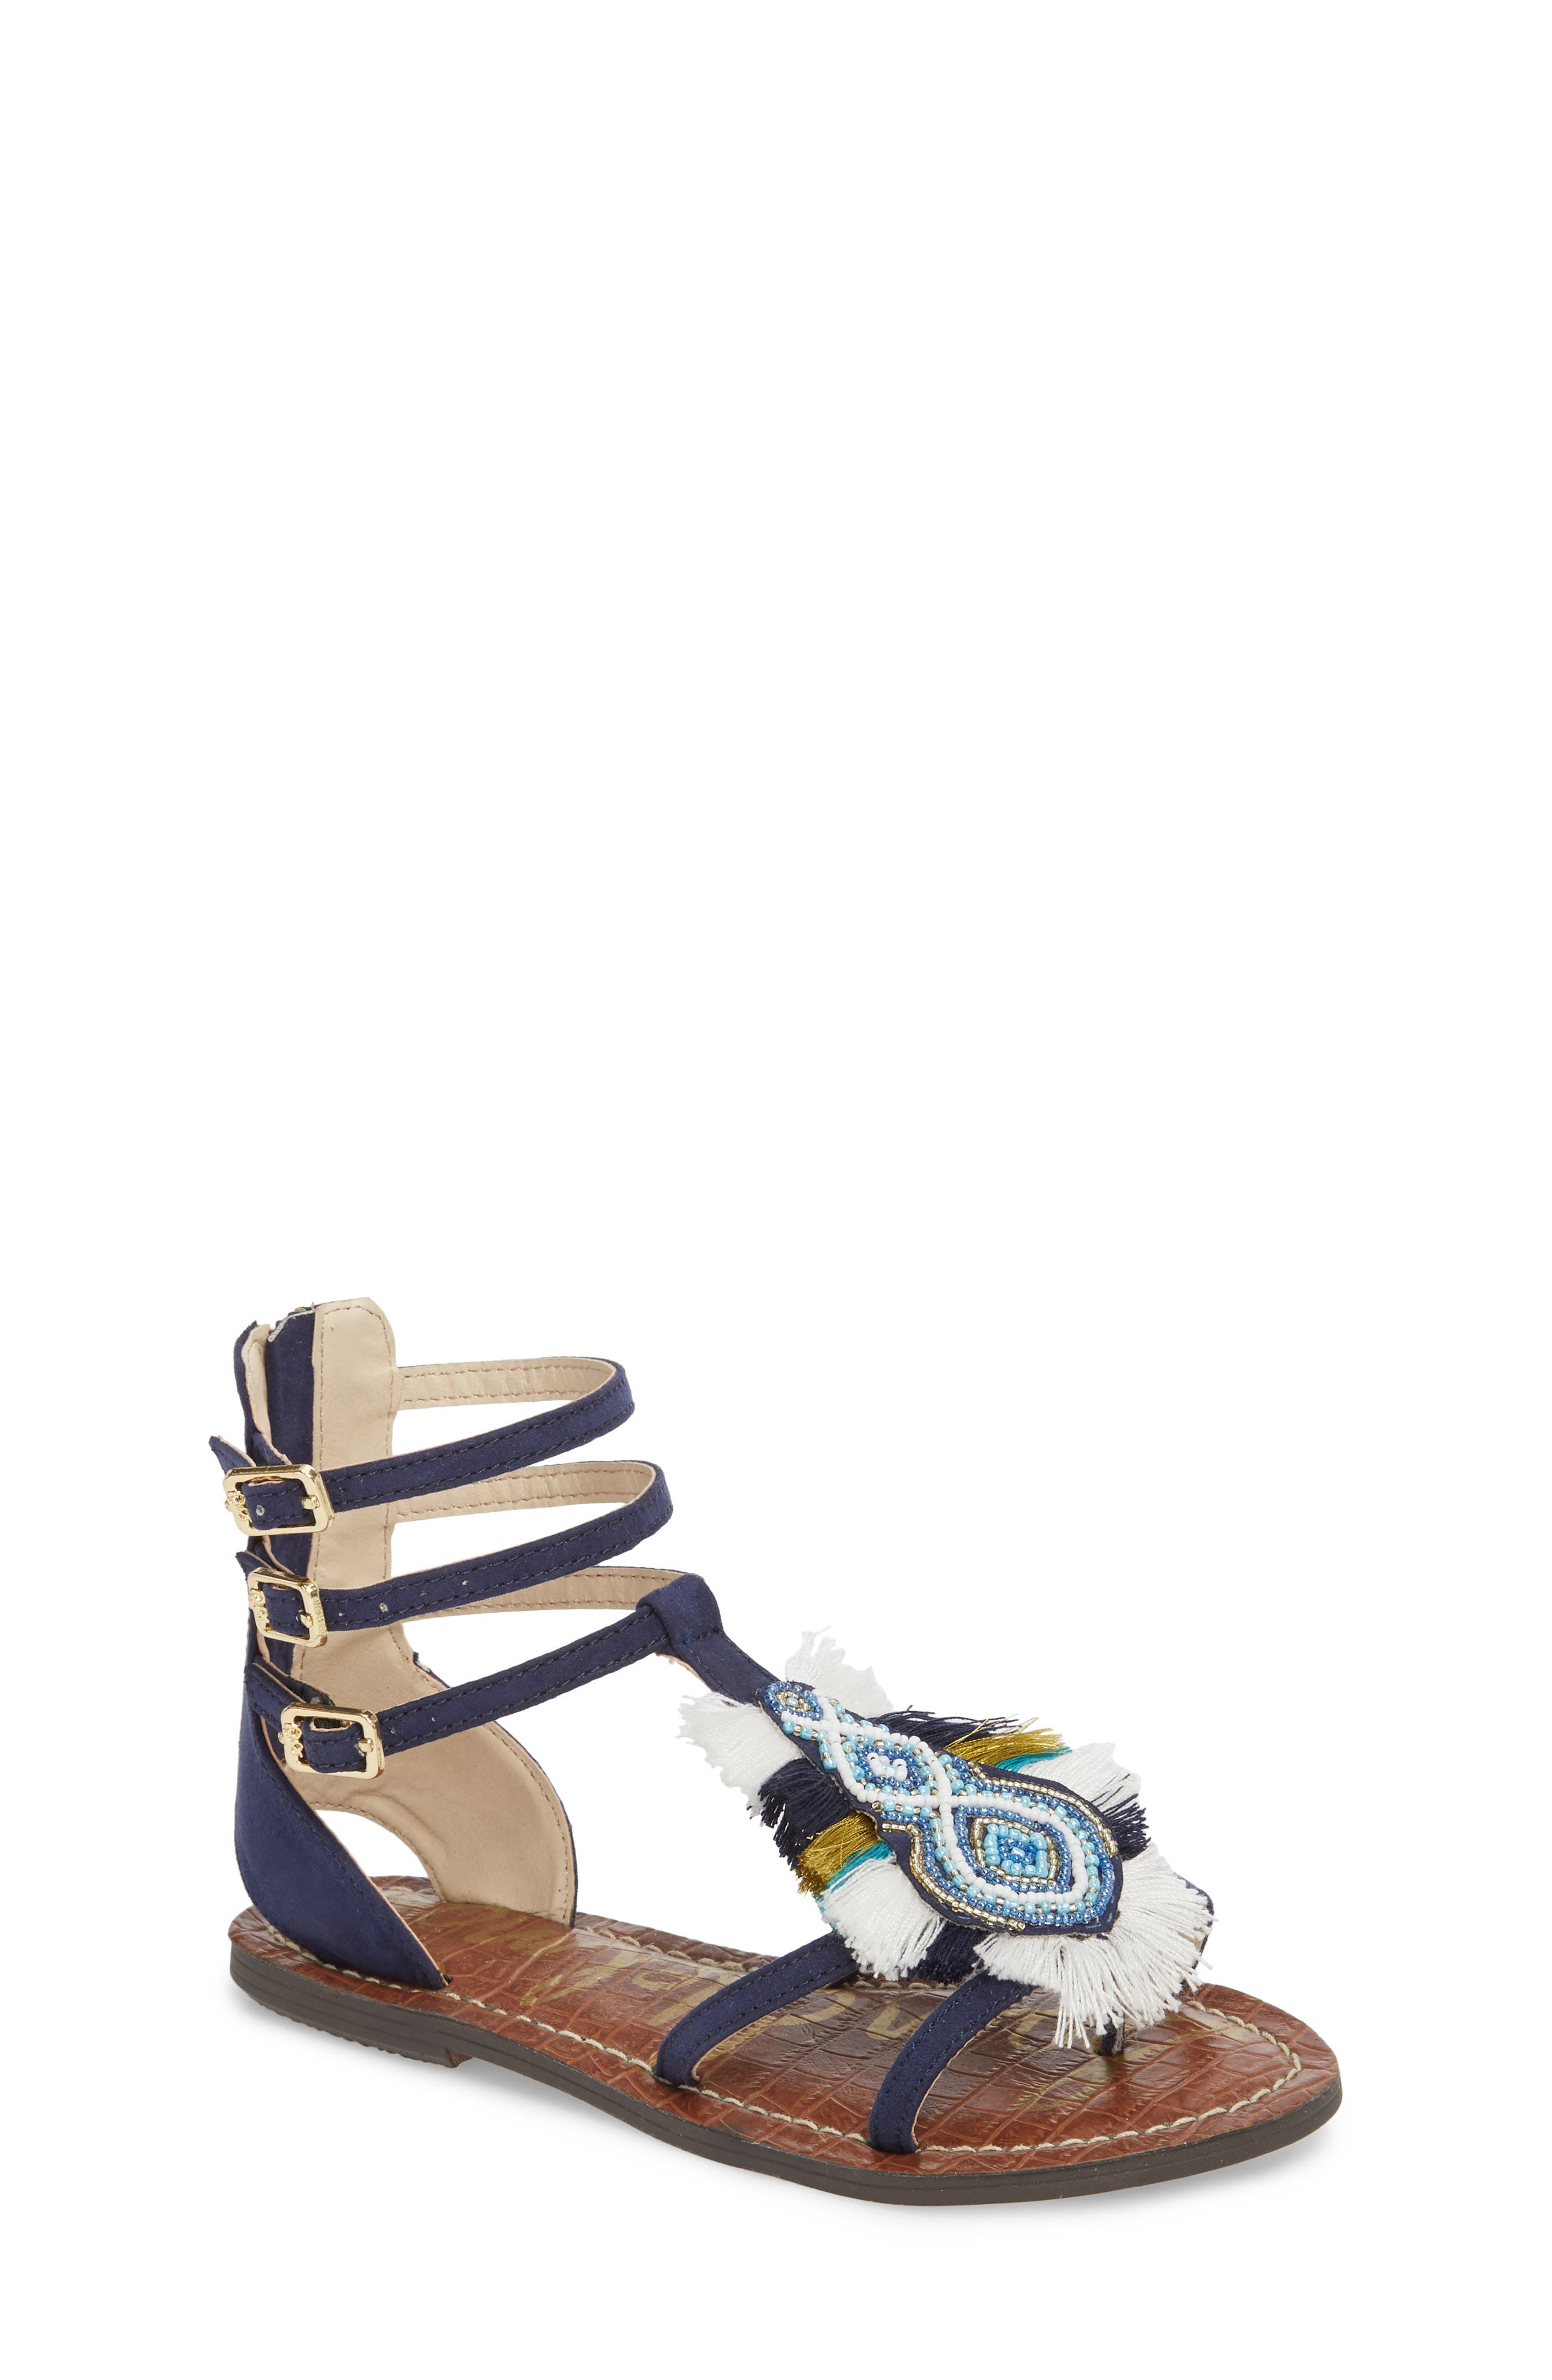 Gigi Giselle Embellished Sandal,                             Main thumbnail 1, color,                             Navy Faux Suede